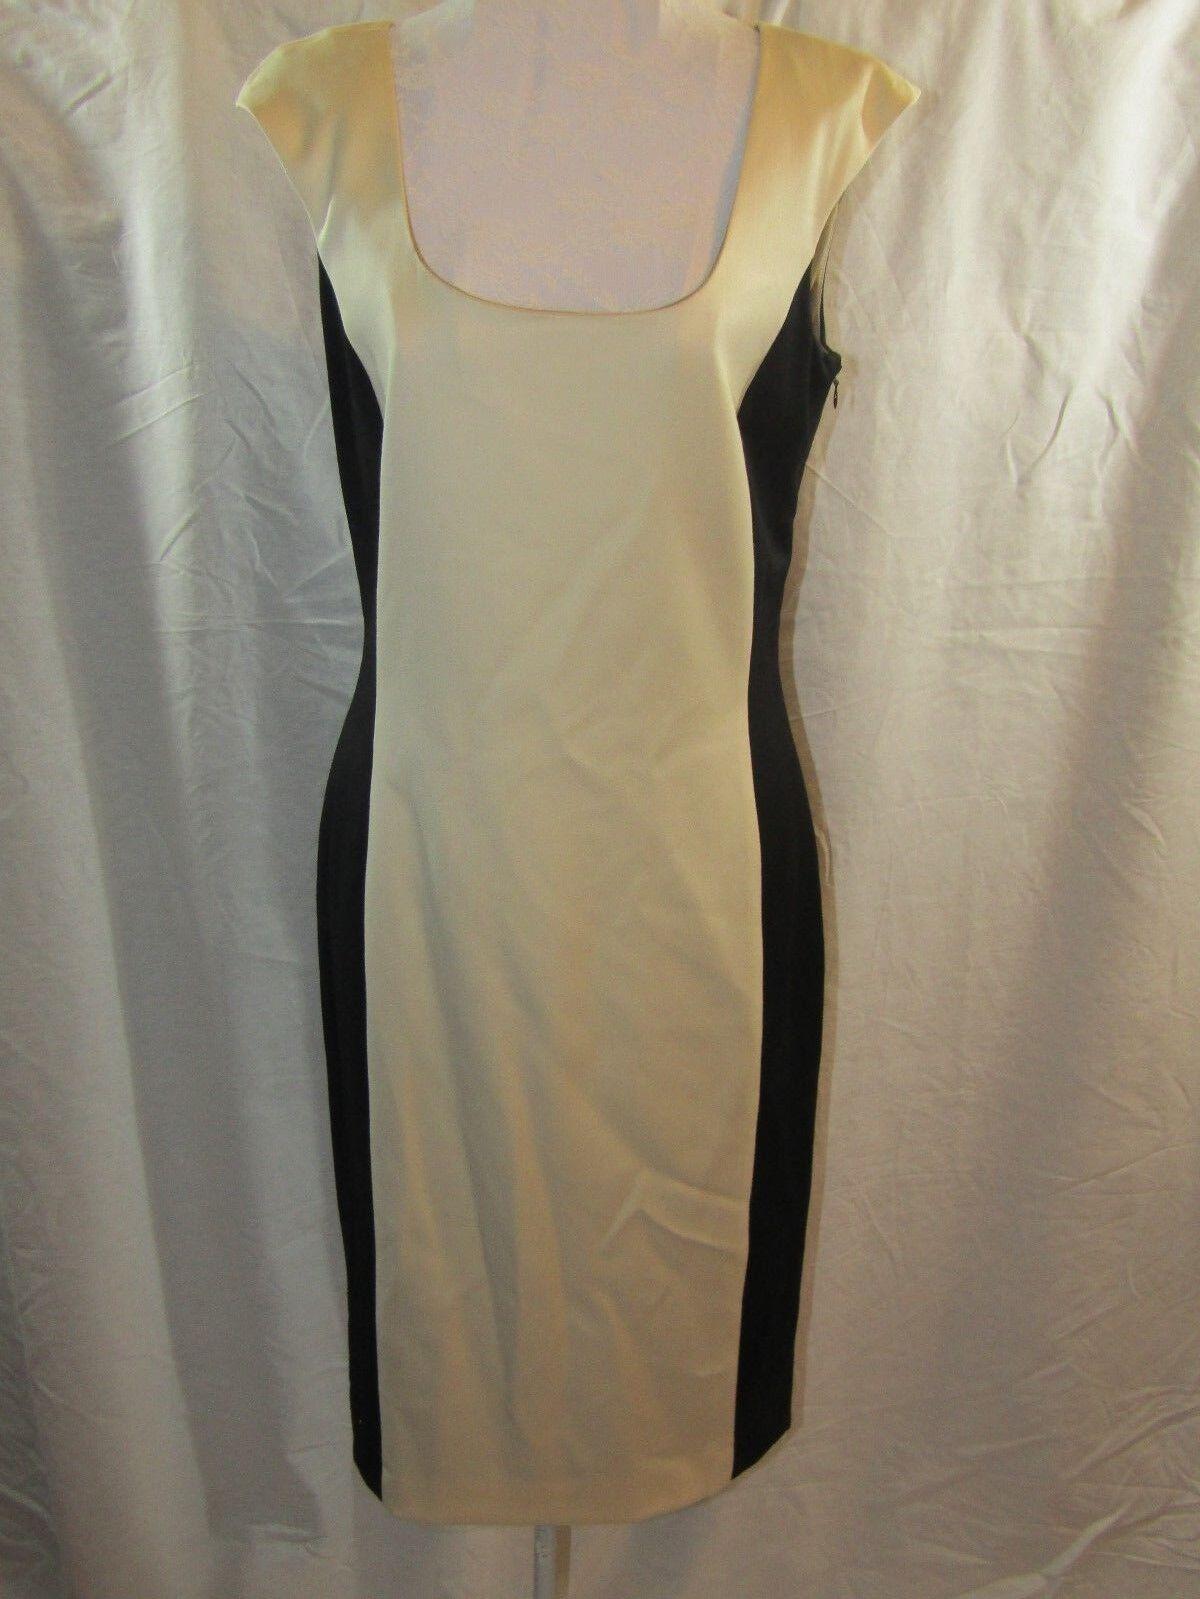 CARLA CARINI Womans Virgin Wool Blend schwarz & Beige Sleeveless Dress Größe 6 NWT